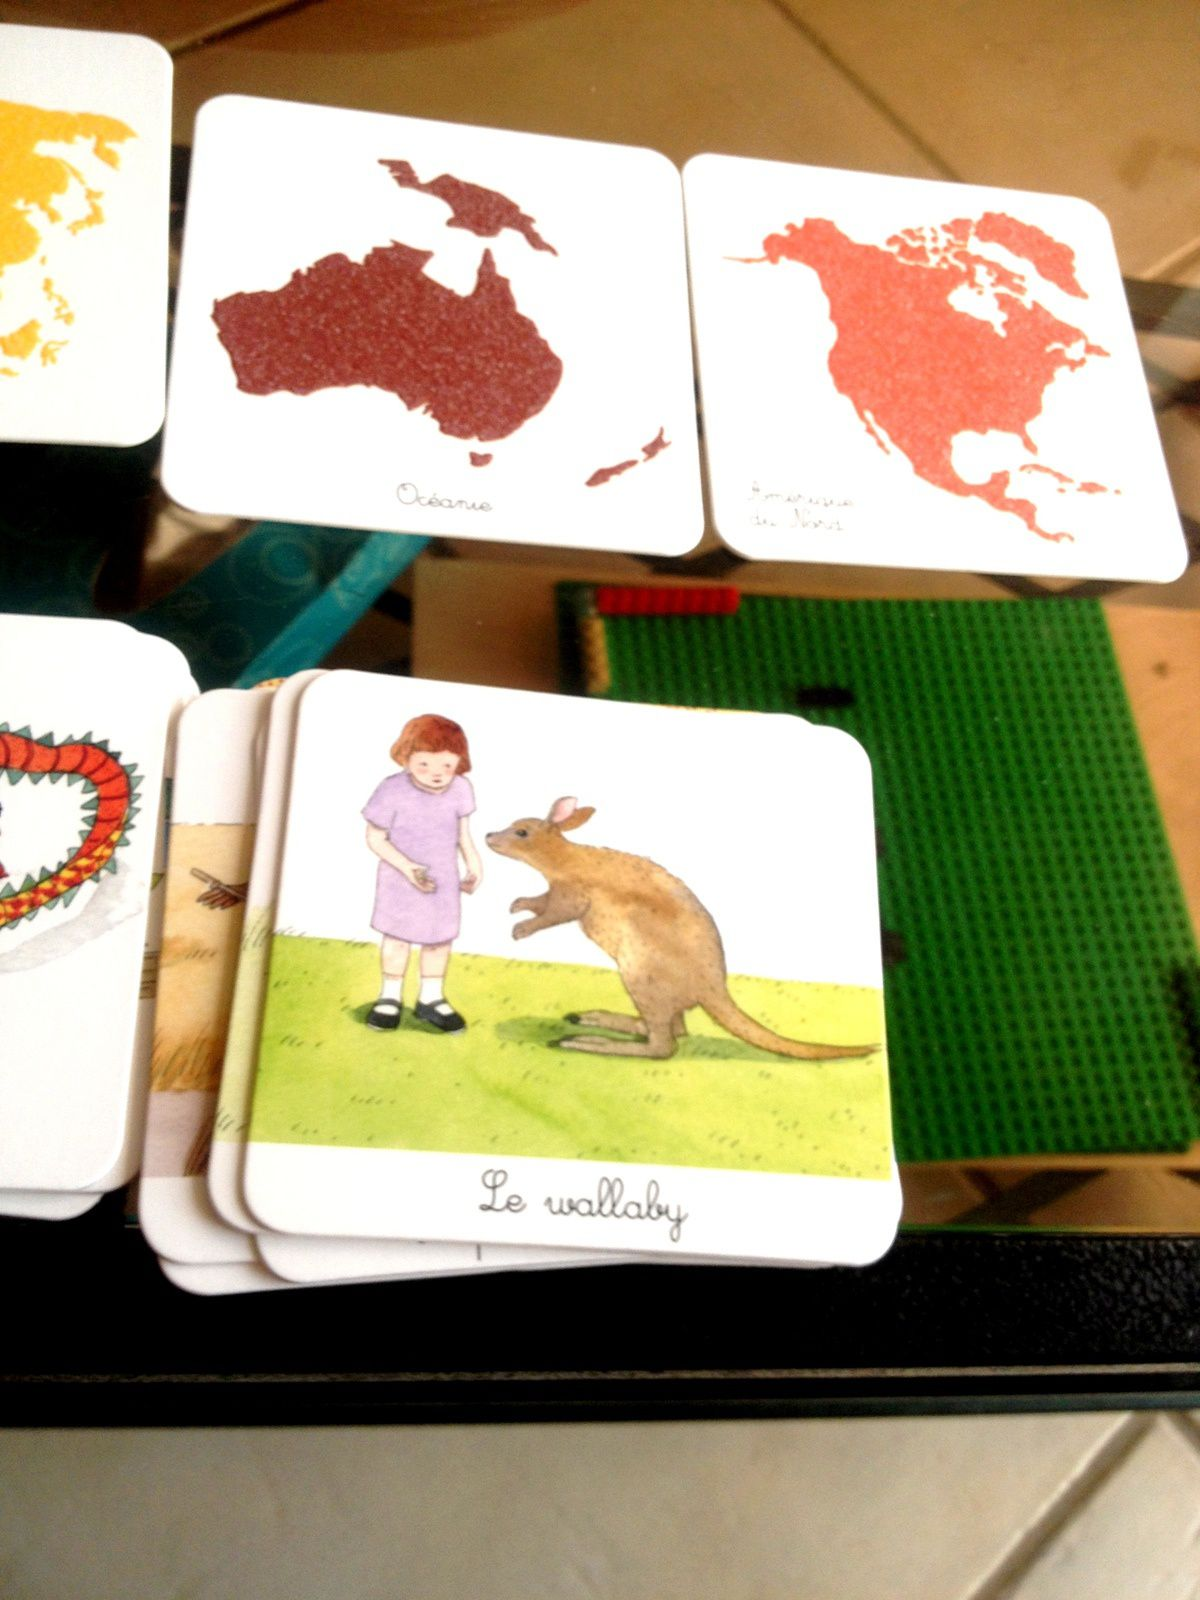 #montessori #monde #charlotteblabla